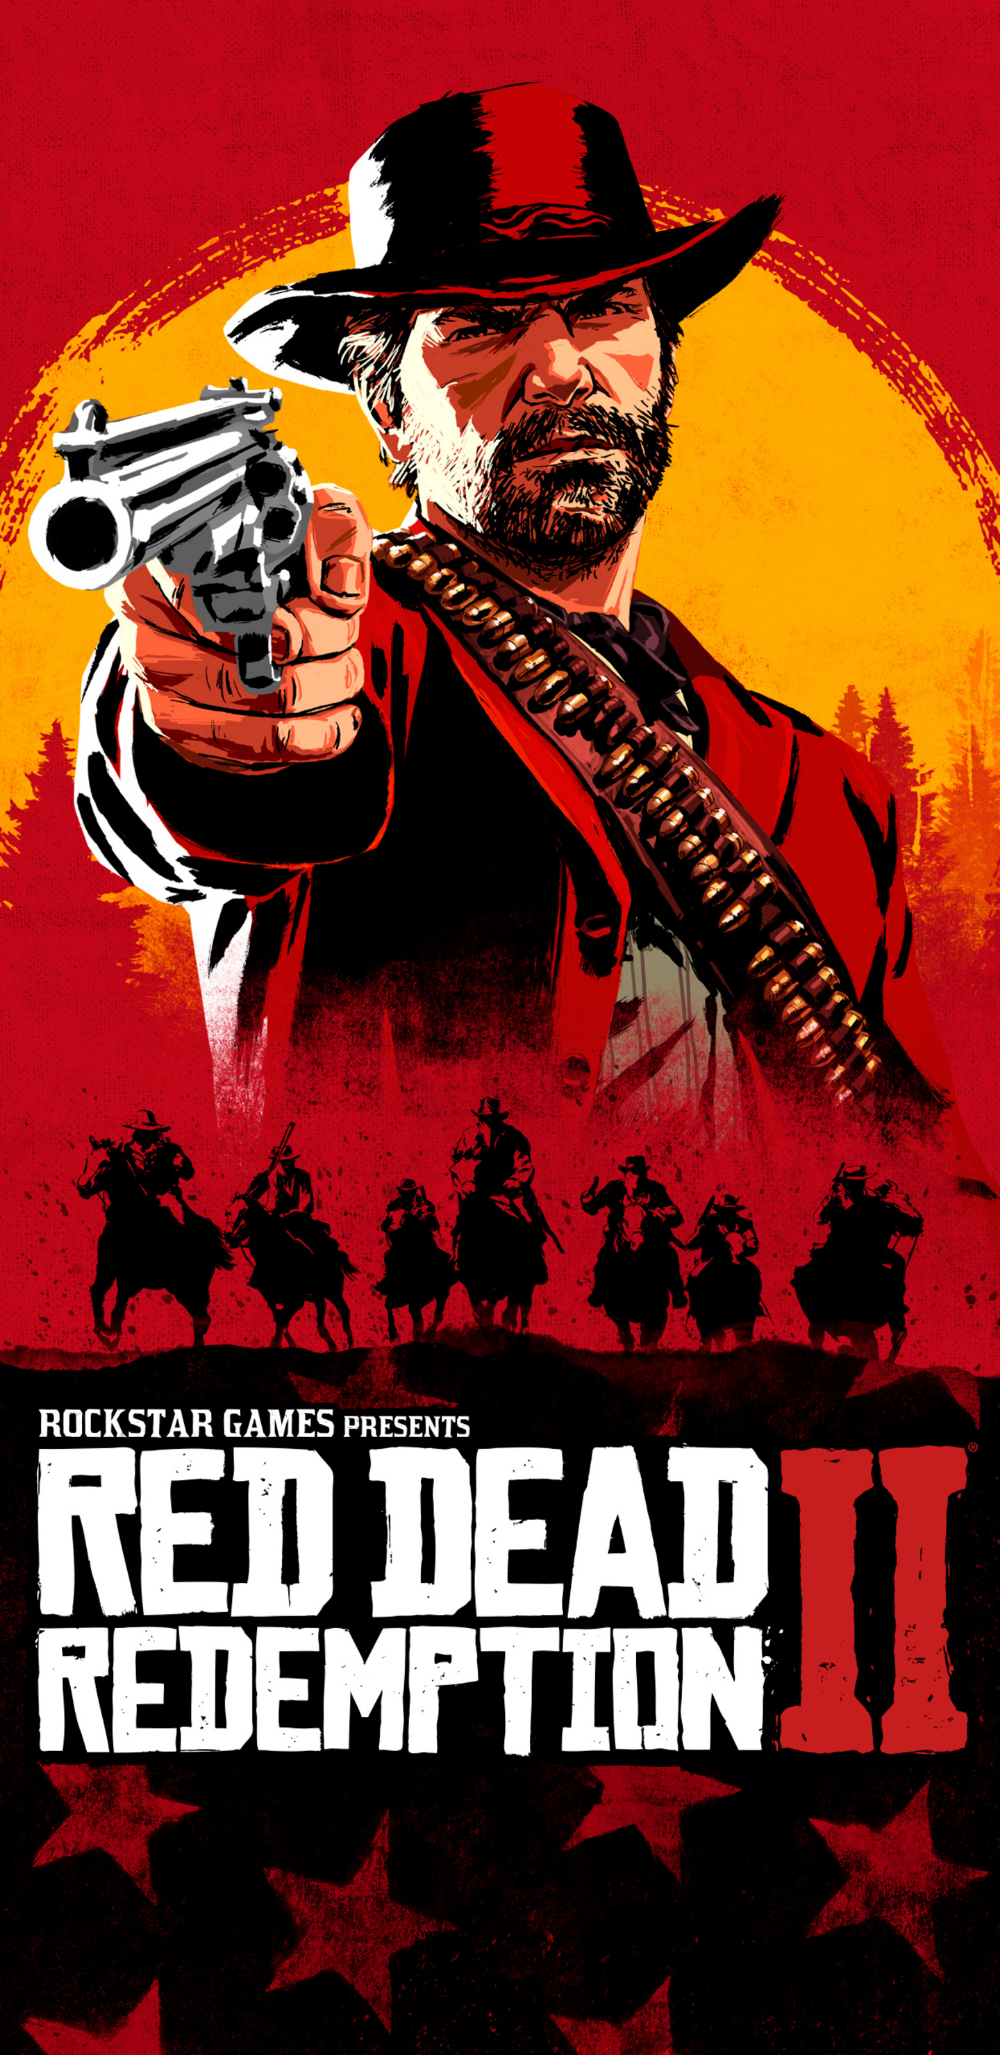 Desperados Iii 2018 Poster 4k Ultra Hd Mobile Wallpaper Red Dead Redemption Artwork Red Dead Redemption Red Dead Redemption Art